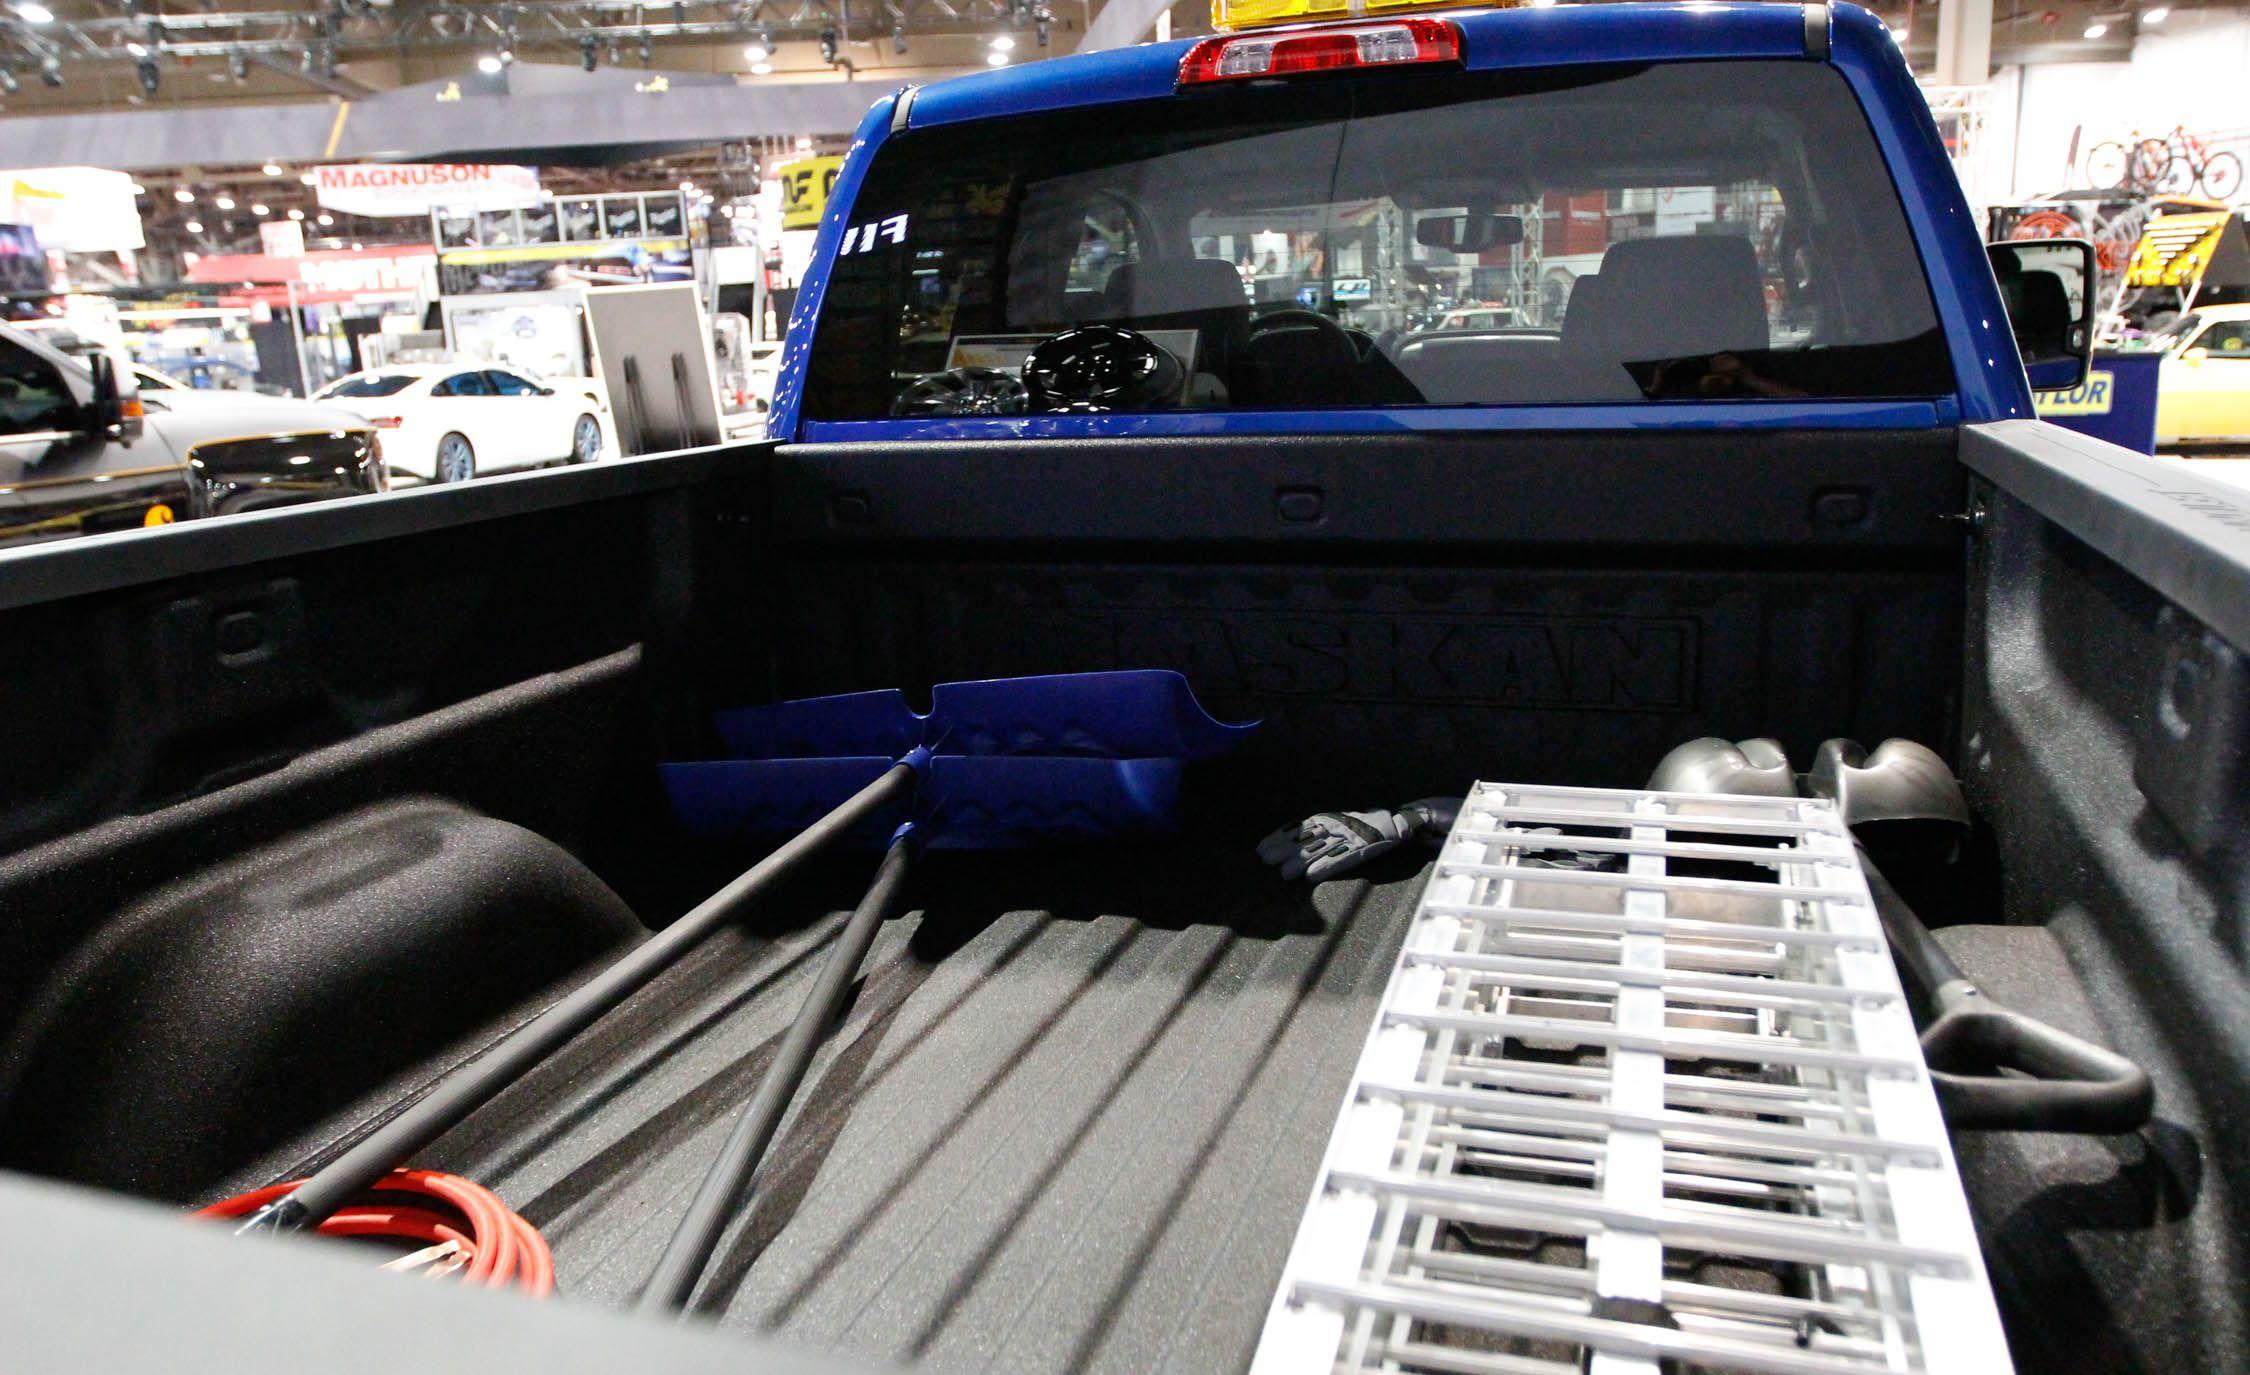 2020 Chevrolet Silverado 2500hd 3500hd Reviews Price Photos And Specs Car Driver